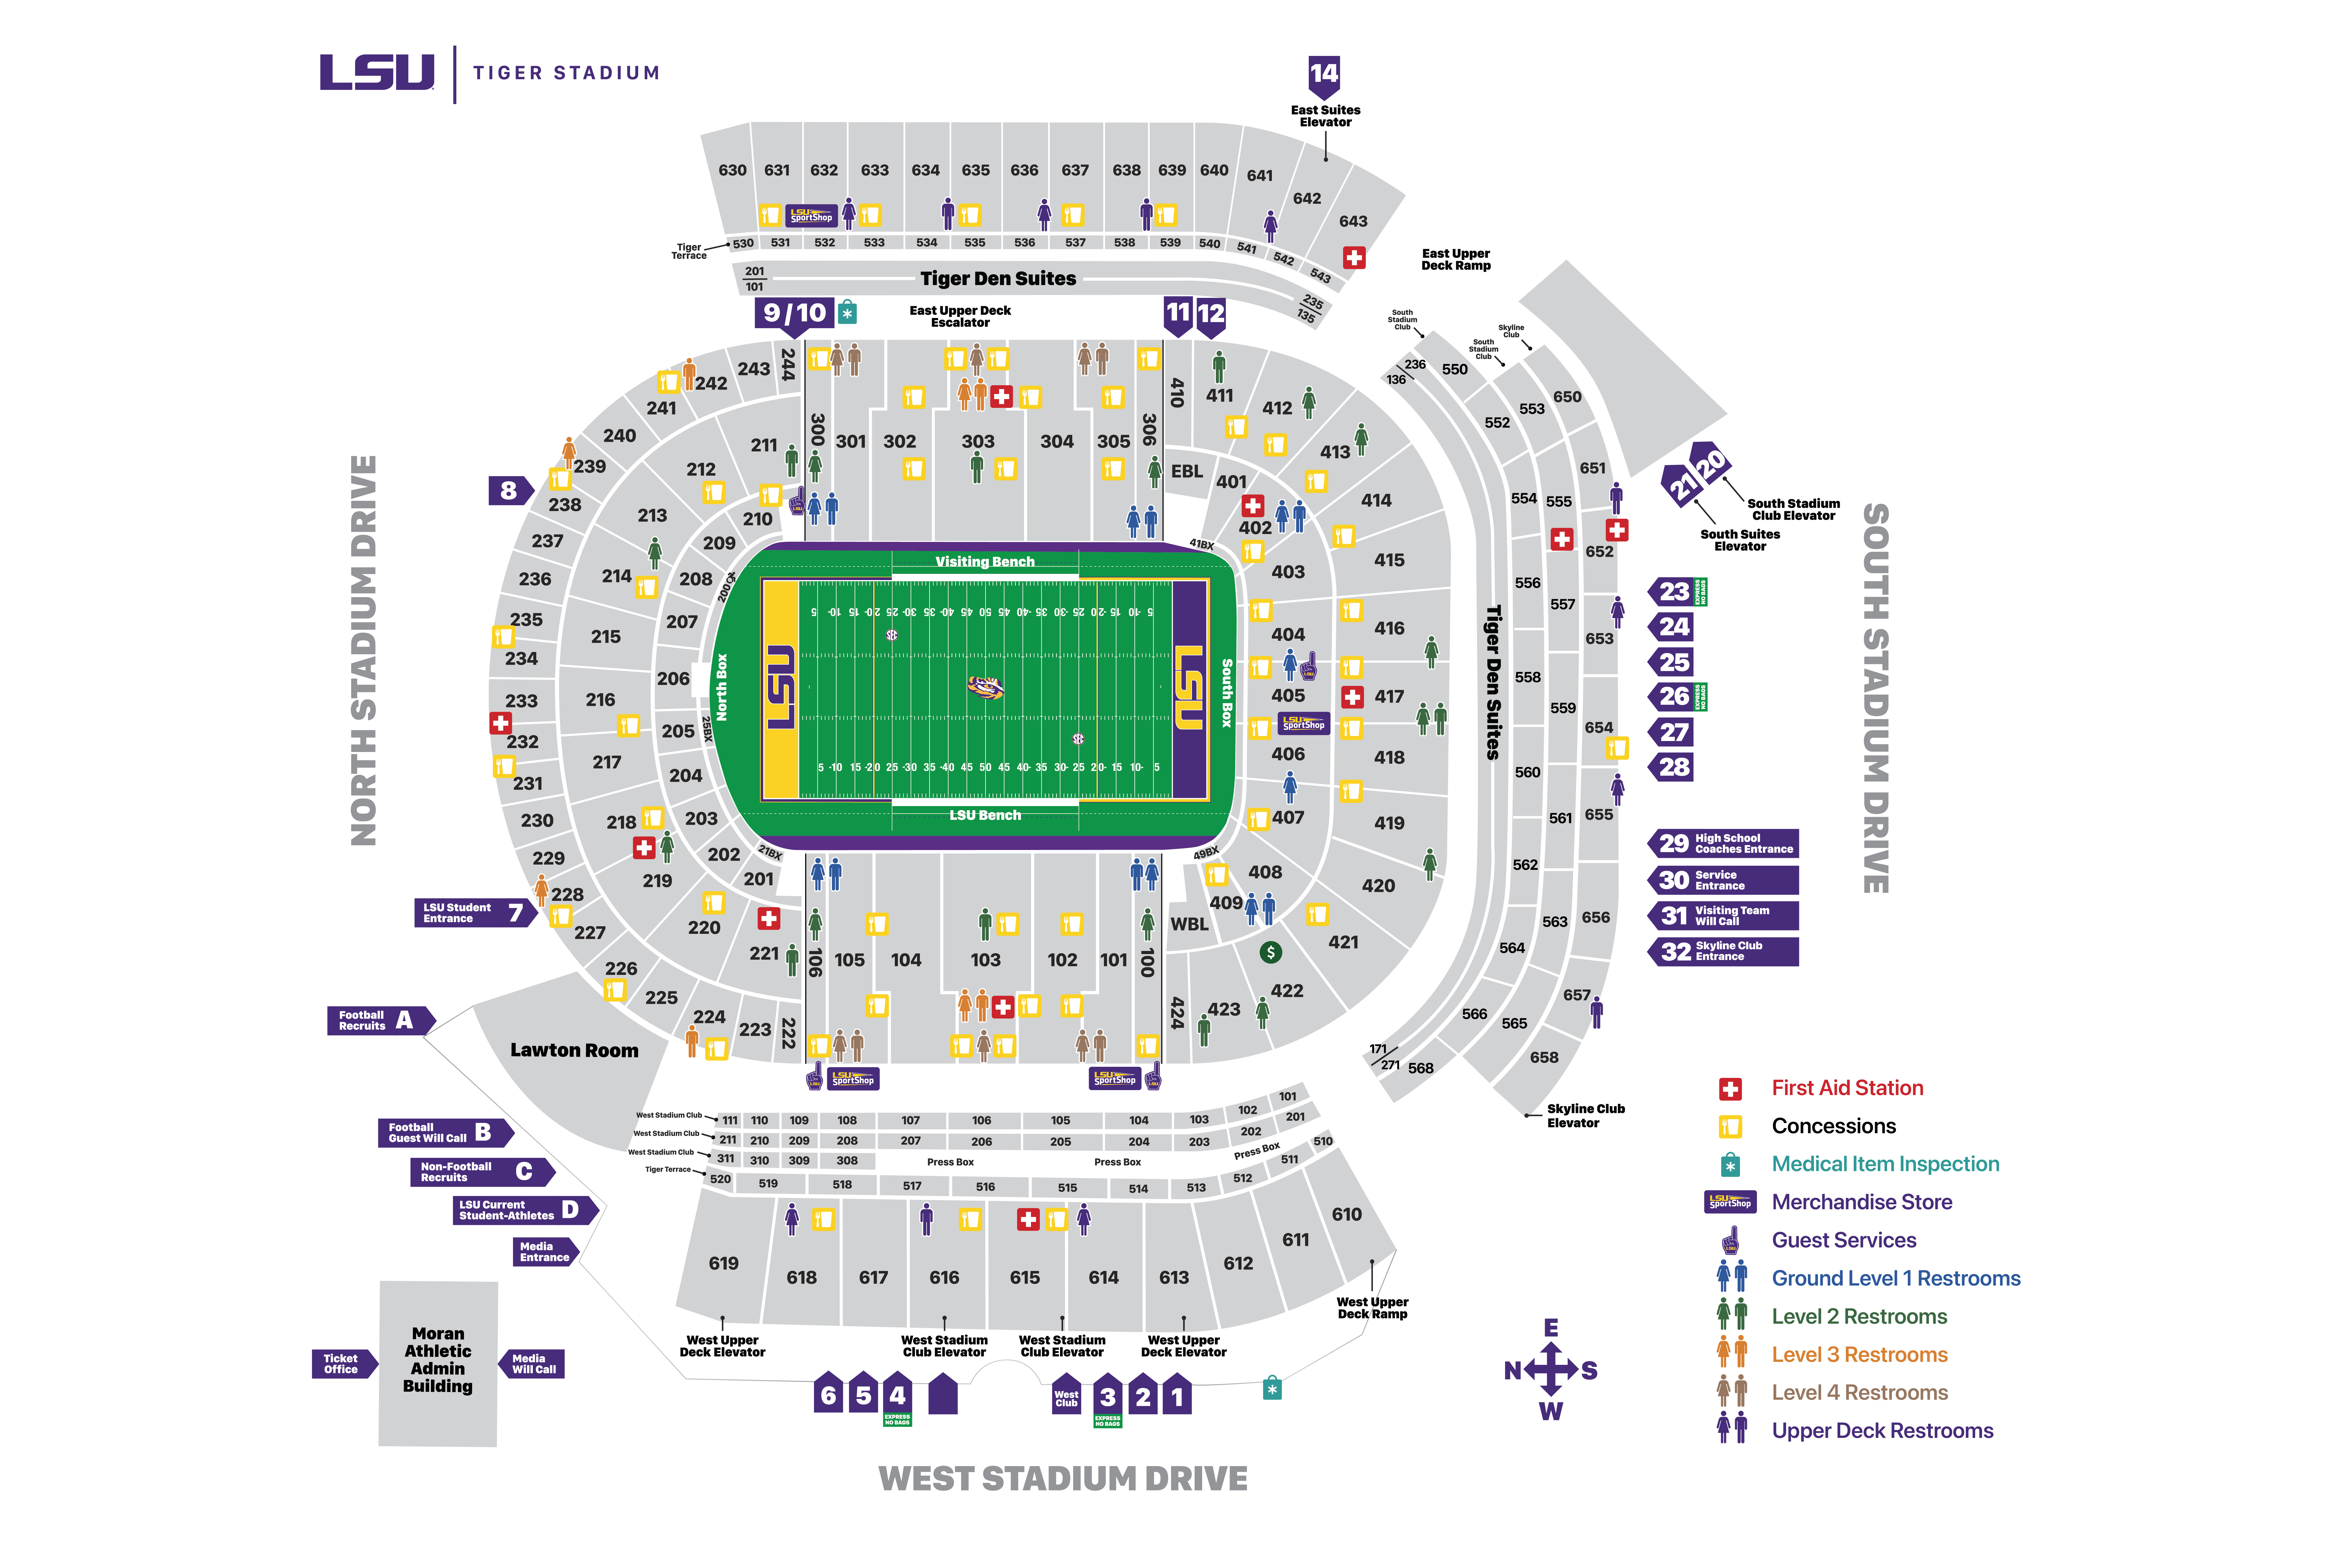 Tiger Stadium Seating Chart - Aug. 11, 2021